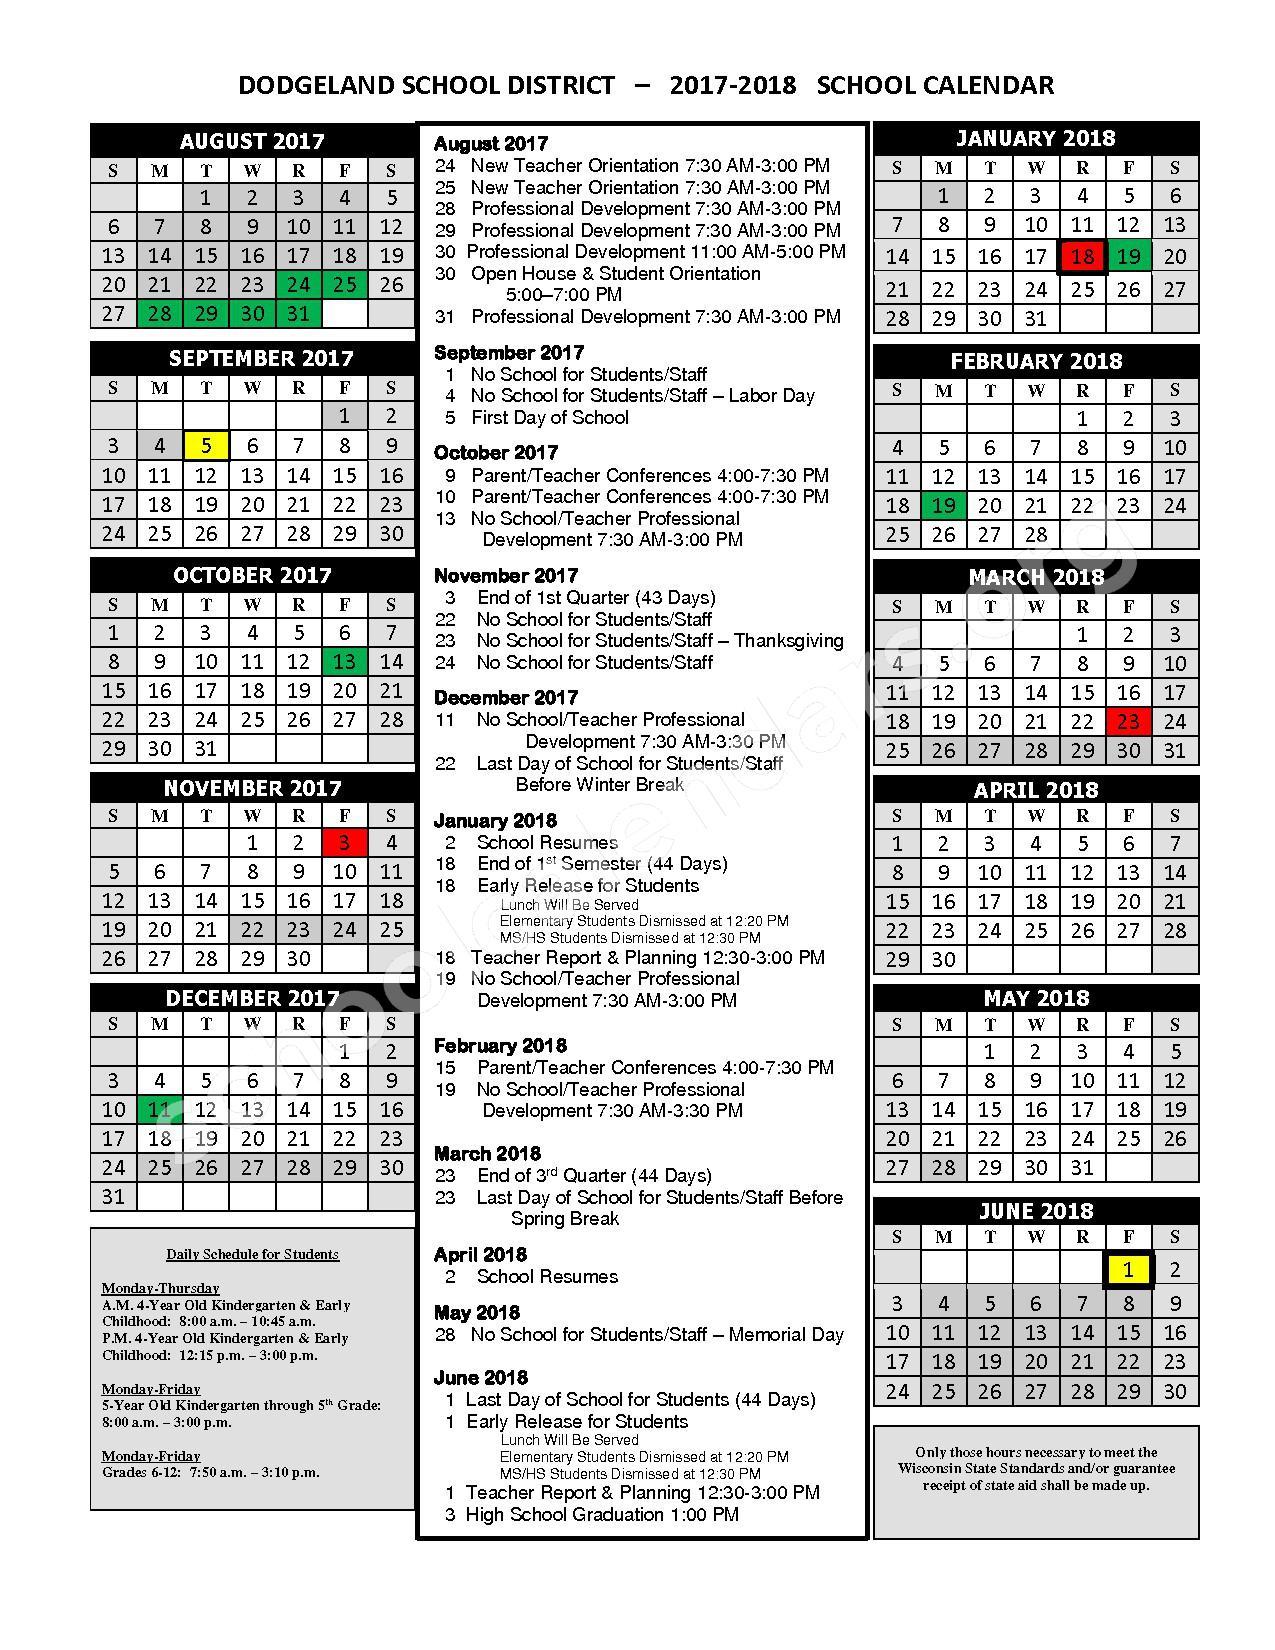 2017 - 2018 School Calendar – Dodgeland School District – page 1